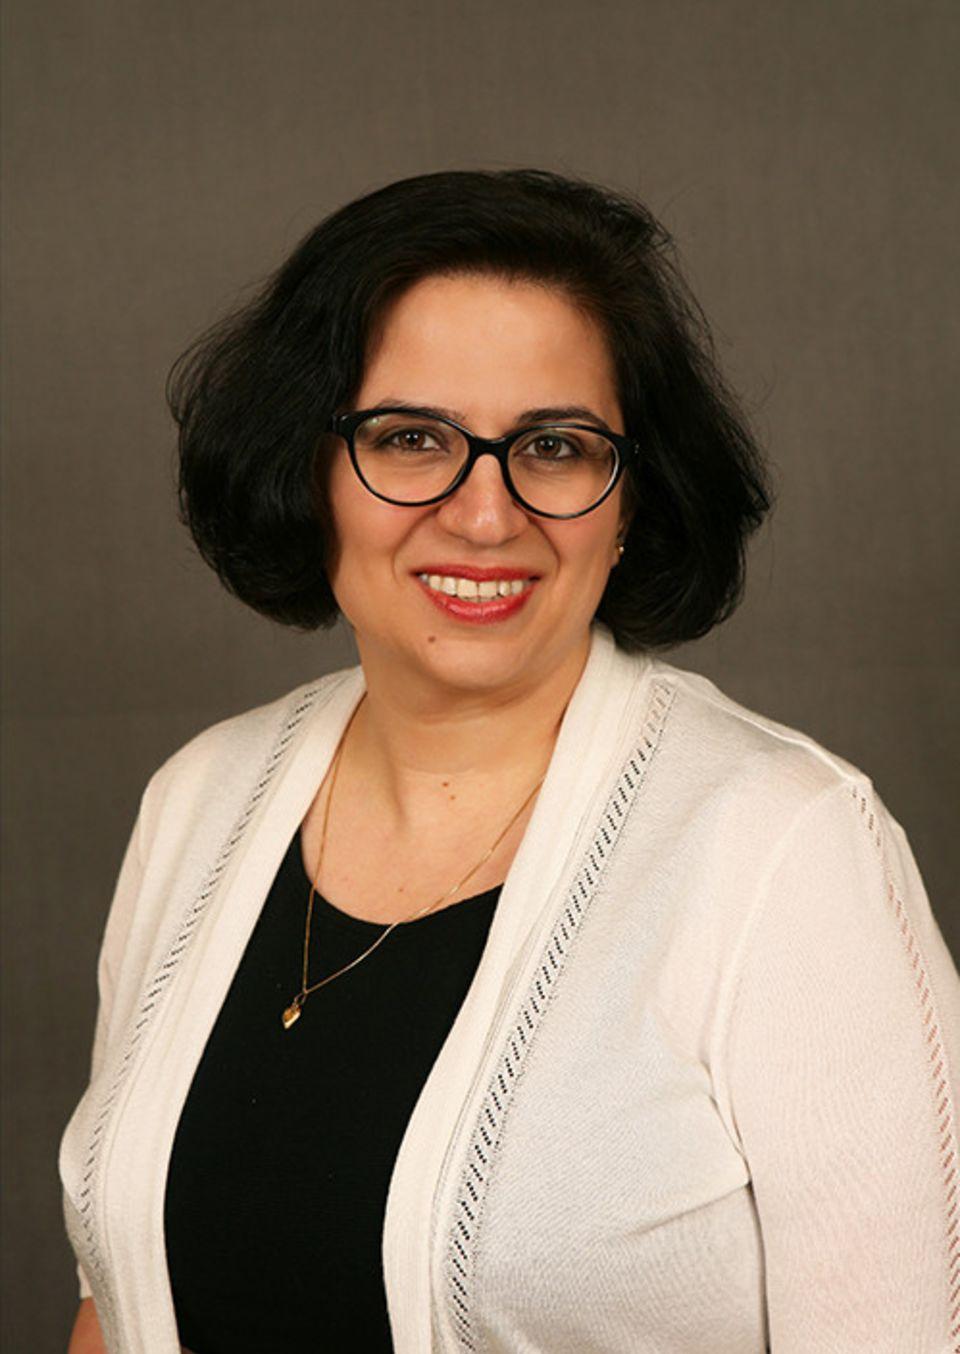 Behnaz Mahmoudi, DDS